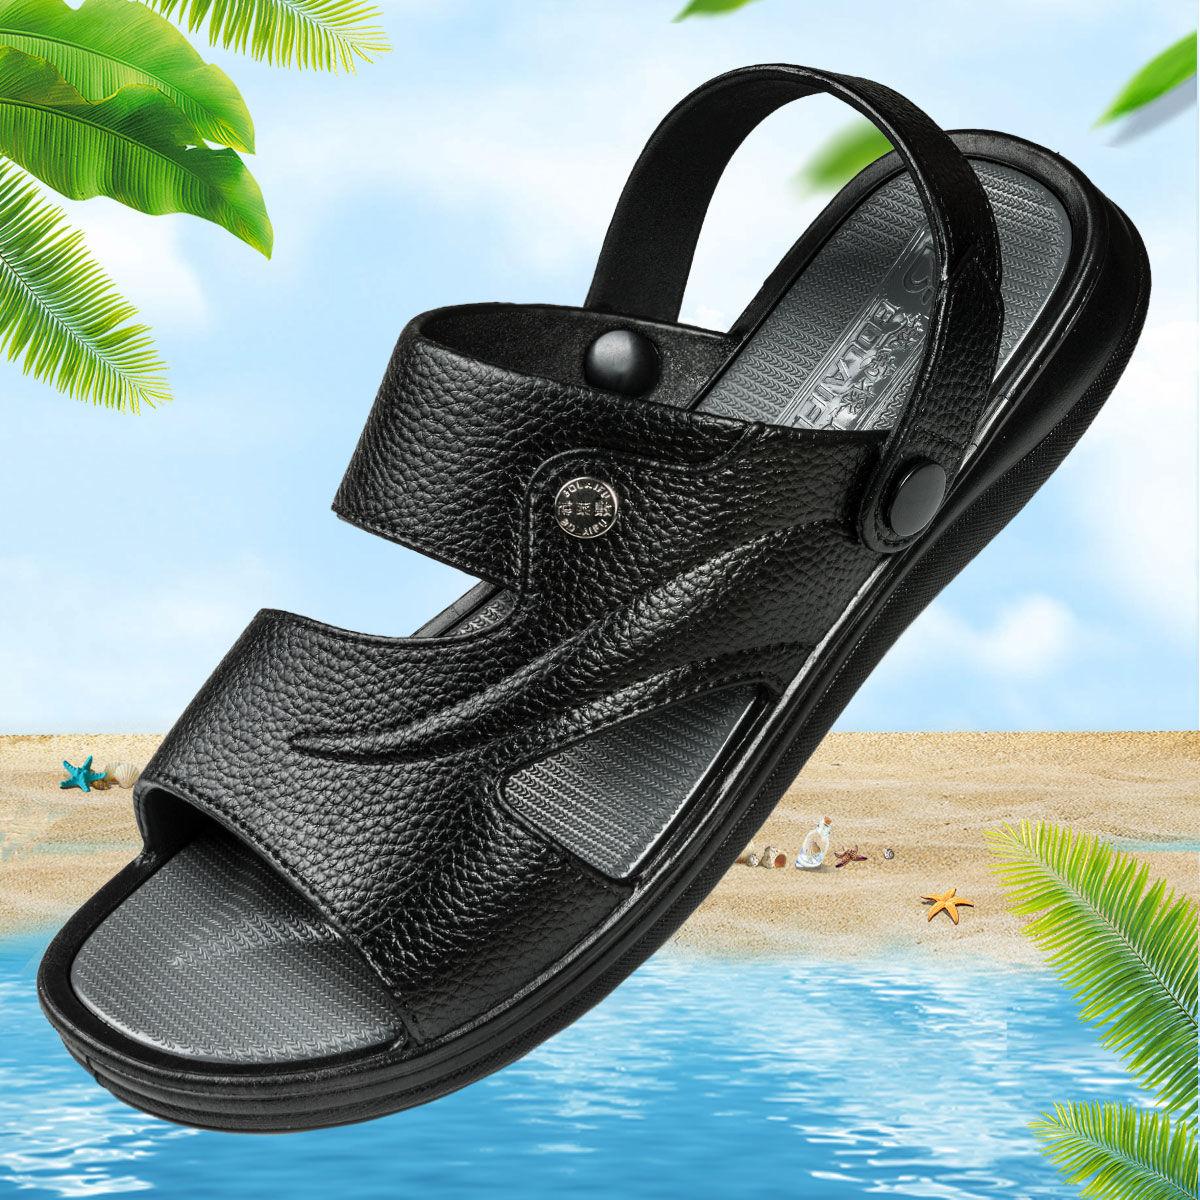 Summer New Men Casual Sandals Beach Classic Pu Leather Slip On Male Flat Sandals Black Mens Summer Sandals